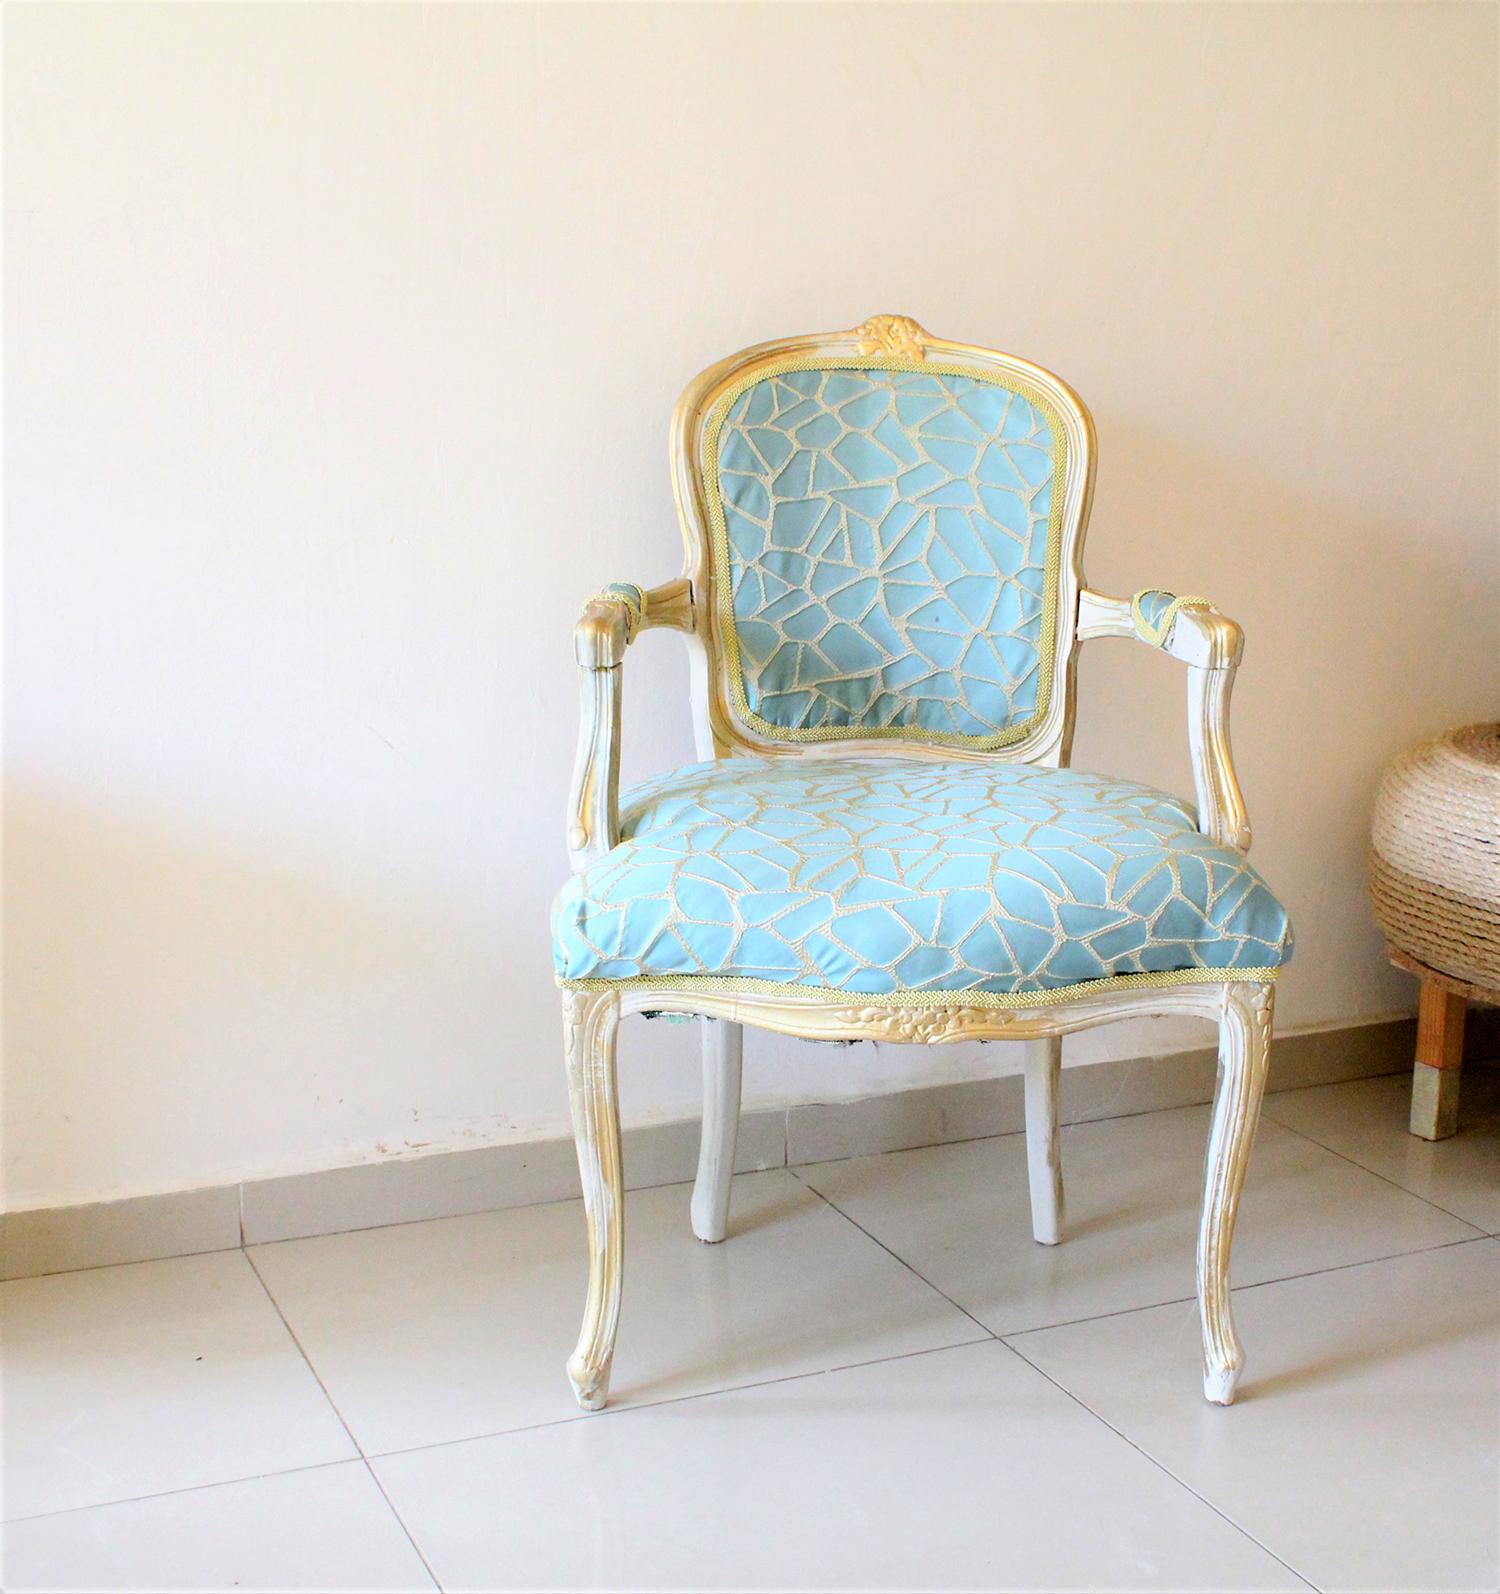 IMG 7453 - חידוש מחודש של שני כסאות